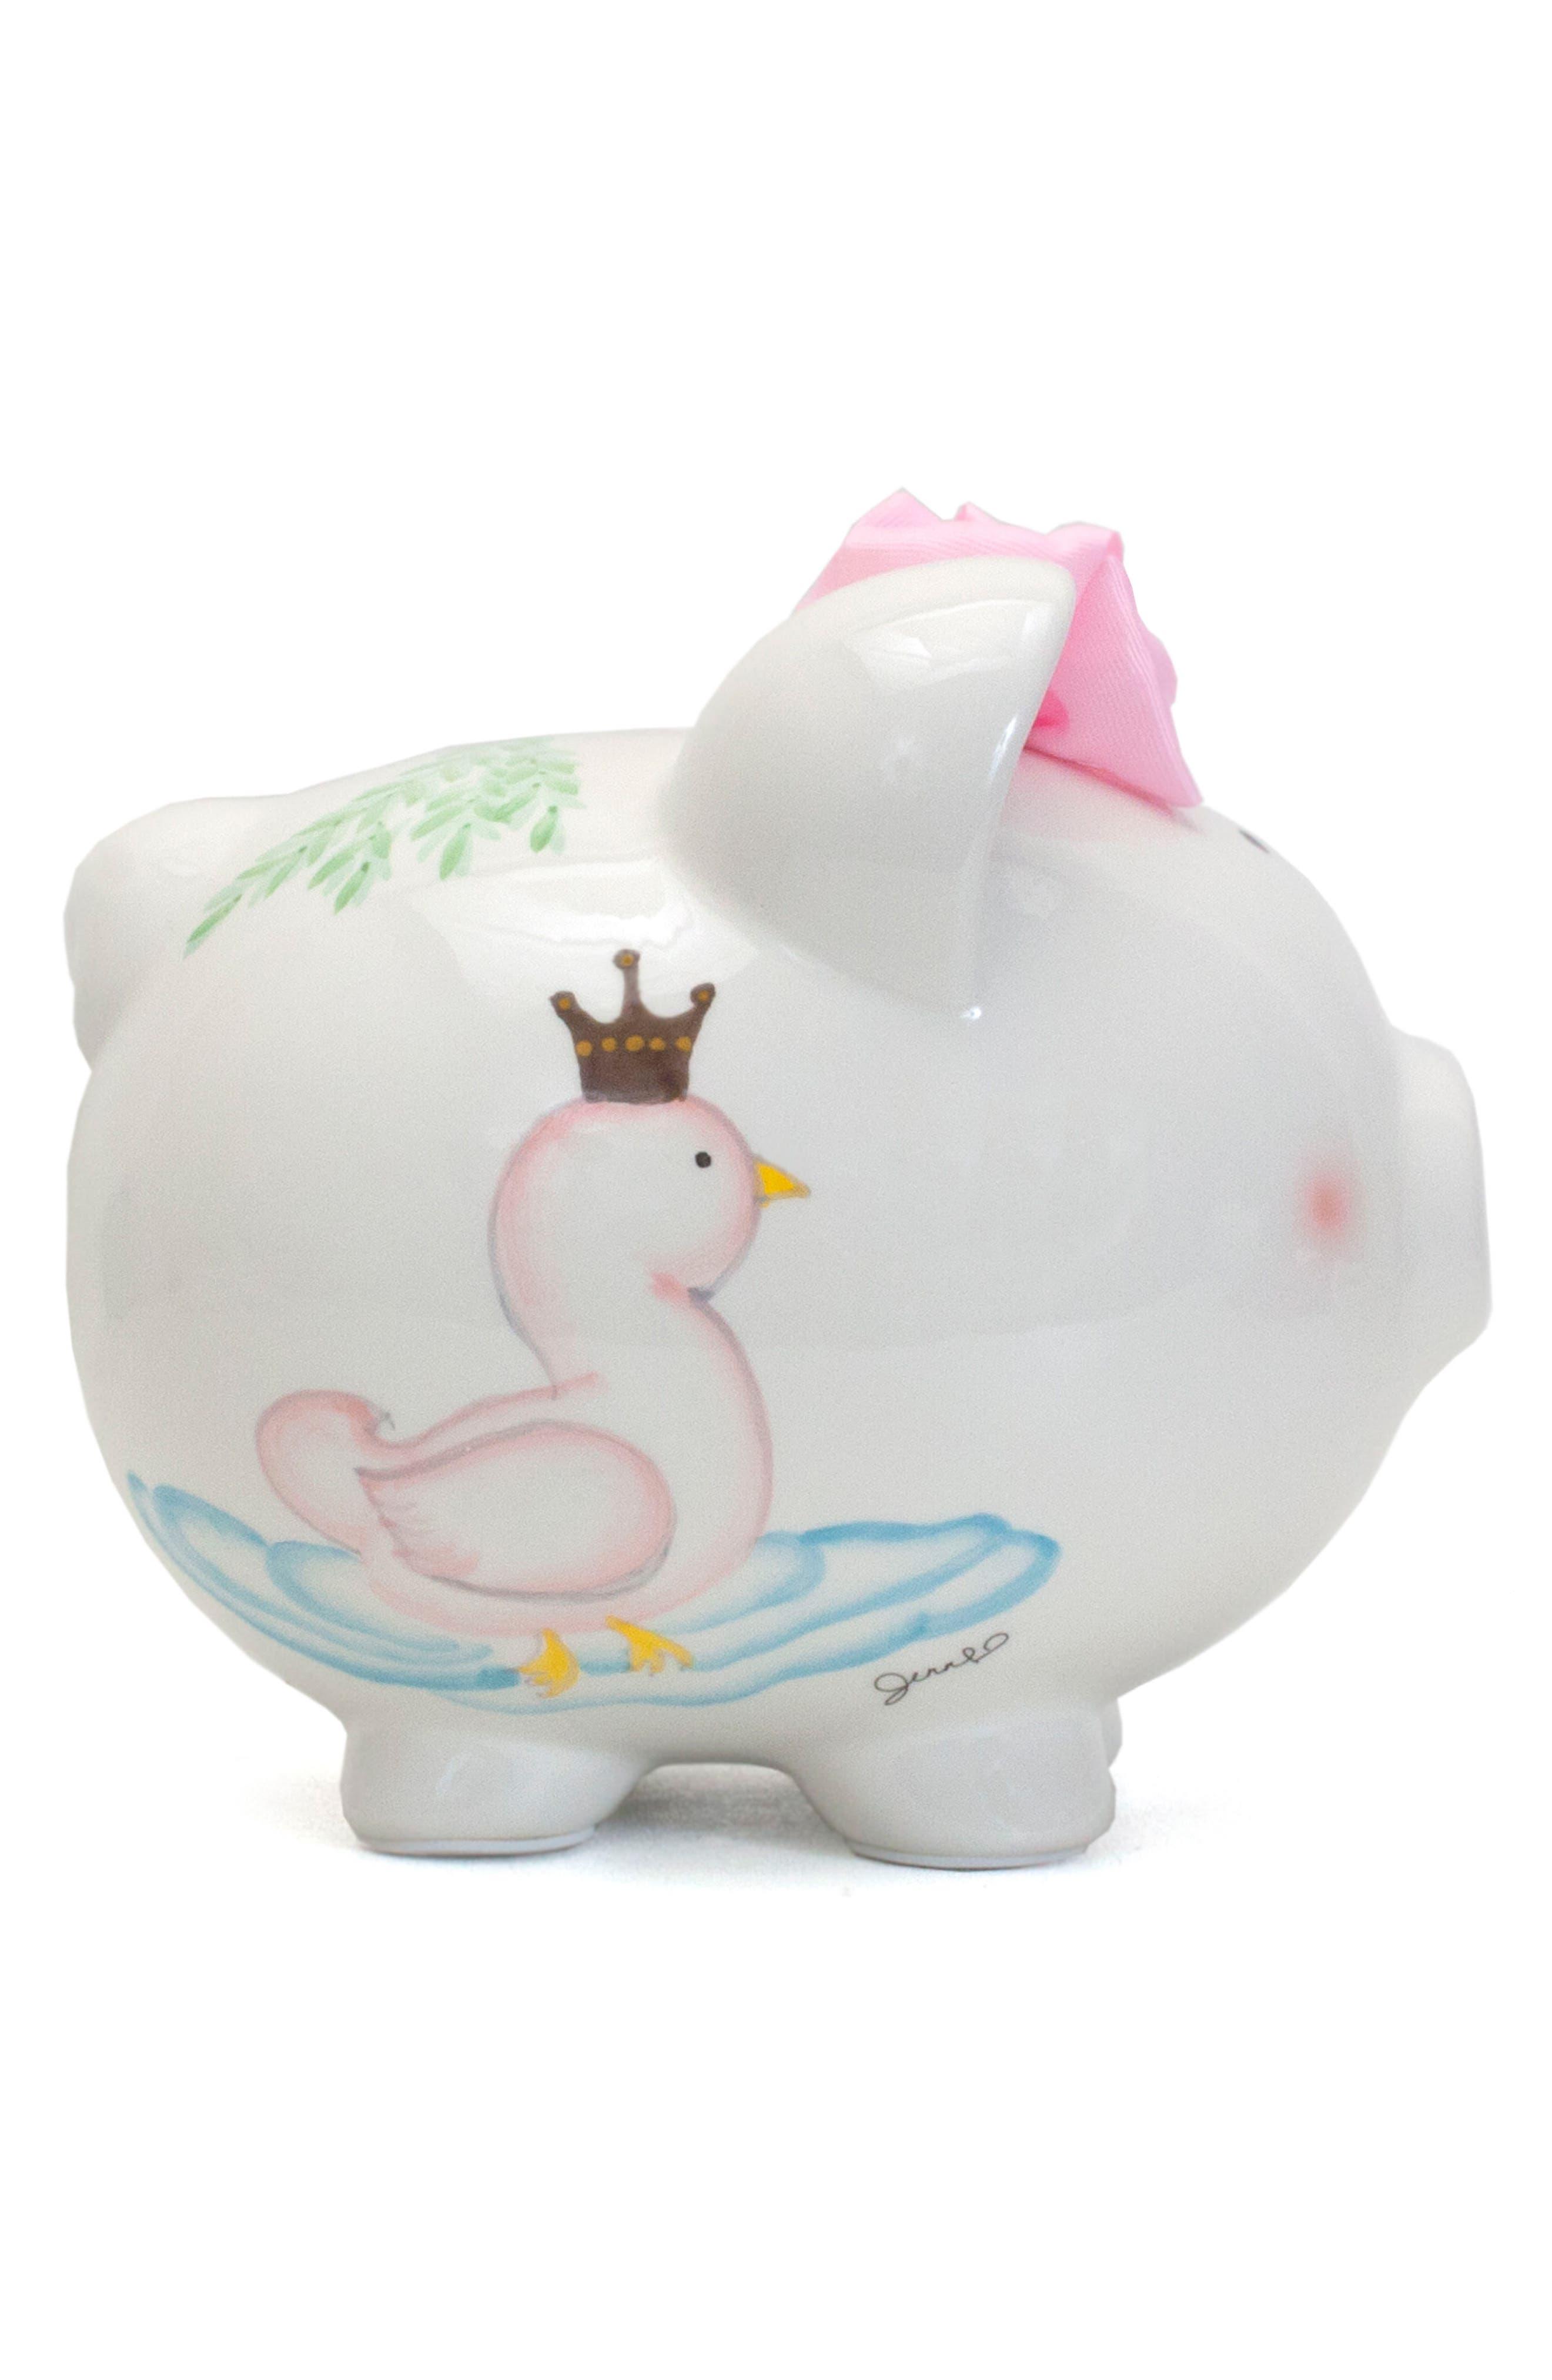 Serena the Swan Pig Bank,                             Alternate thumbnail 5, color,                             White